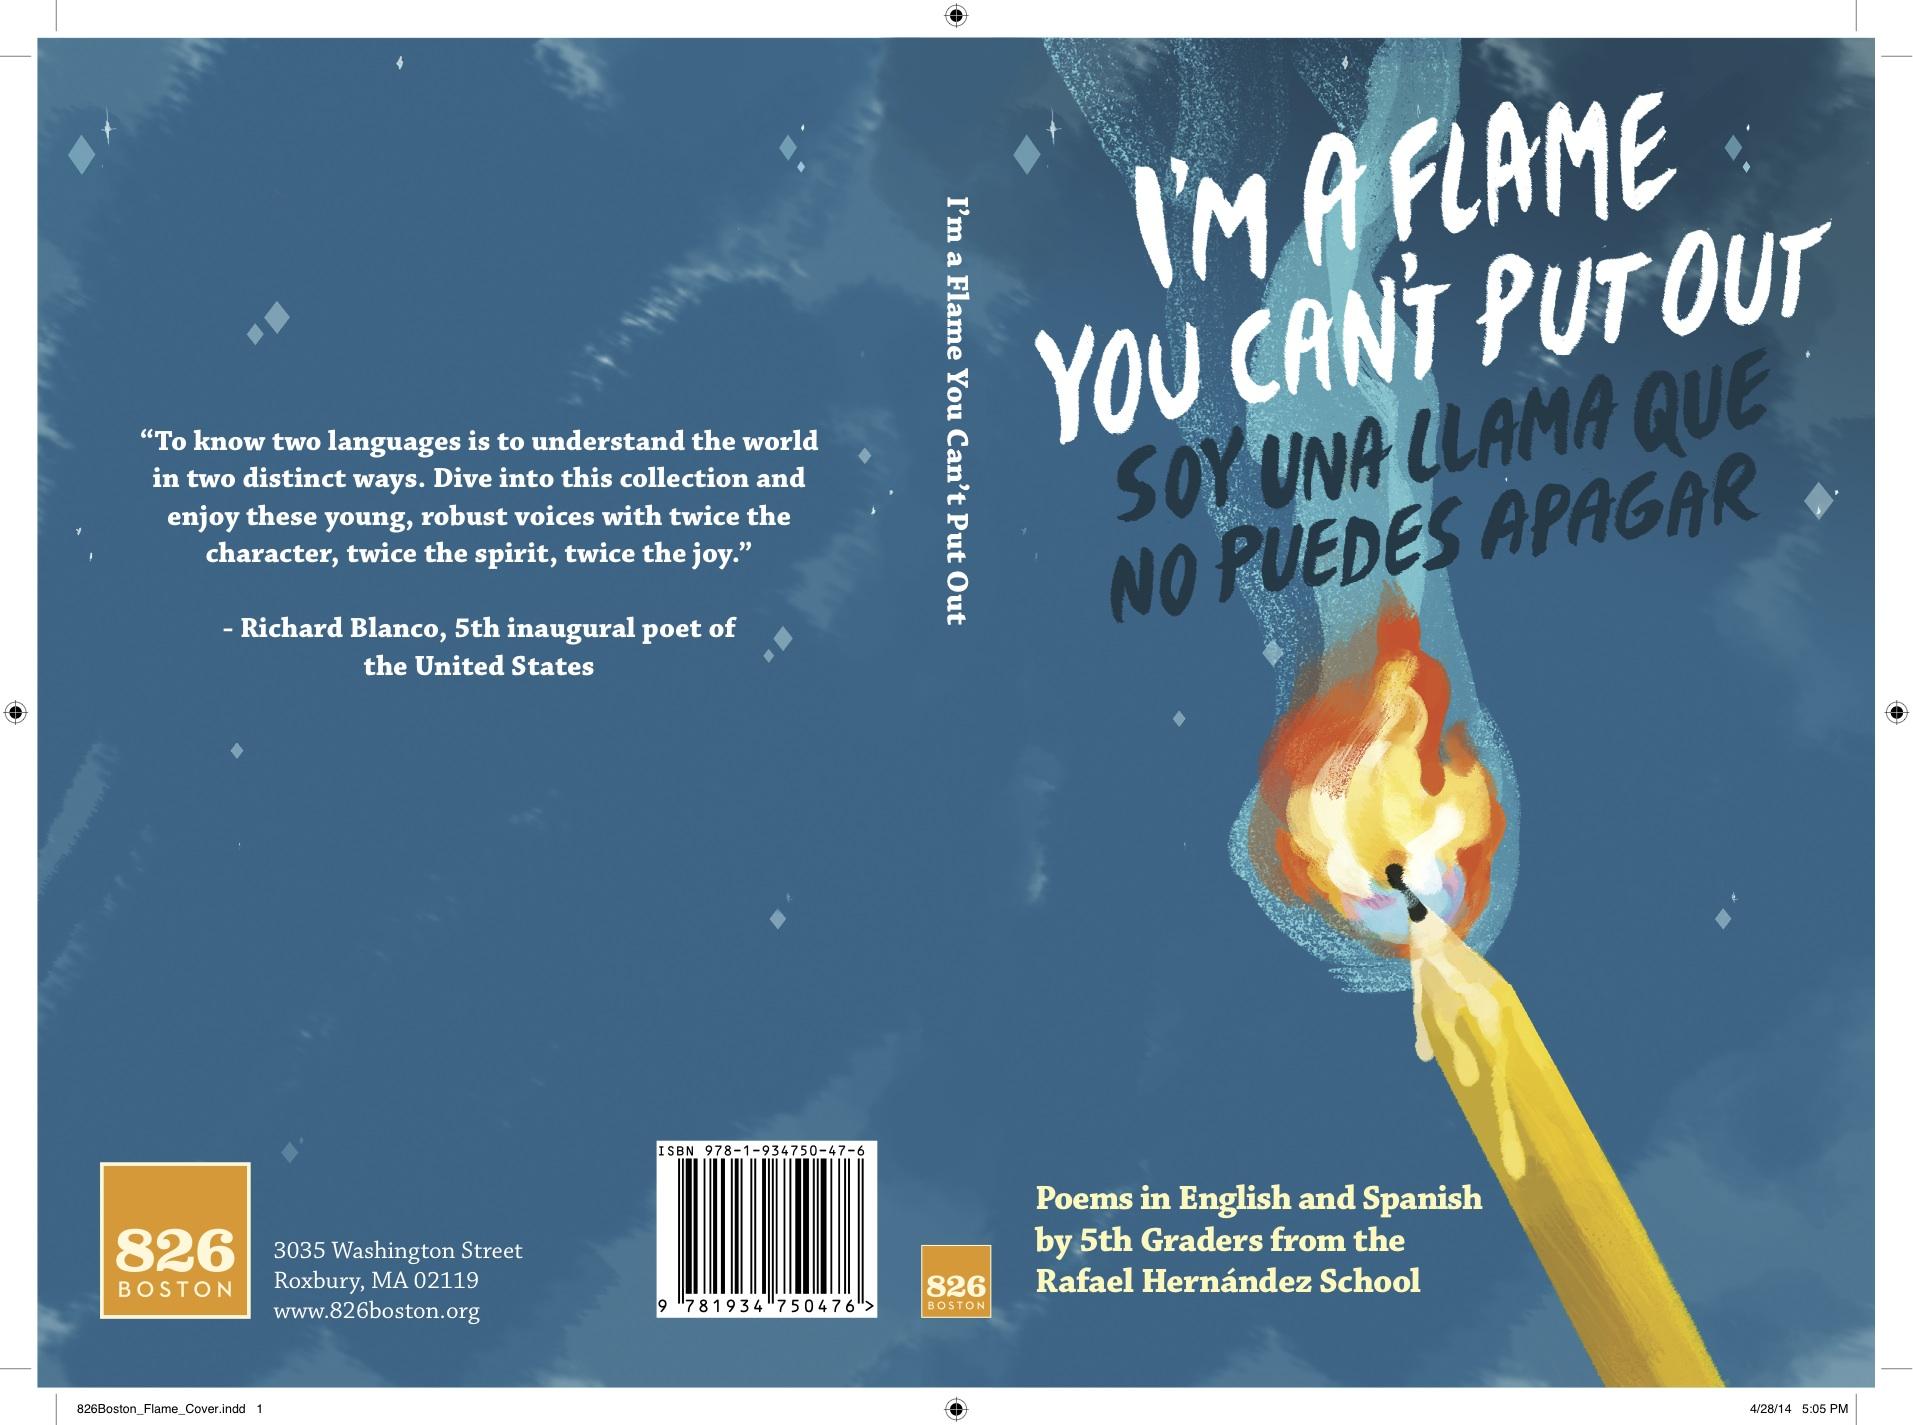 826Boston_Flame_Cover